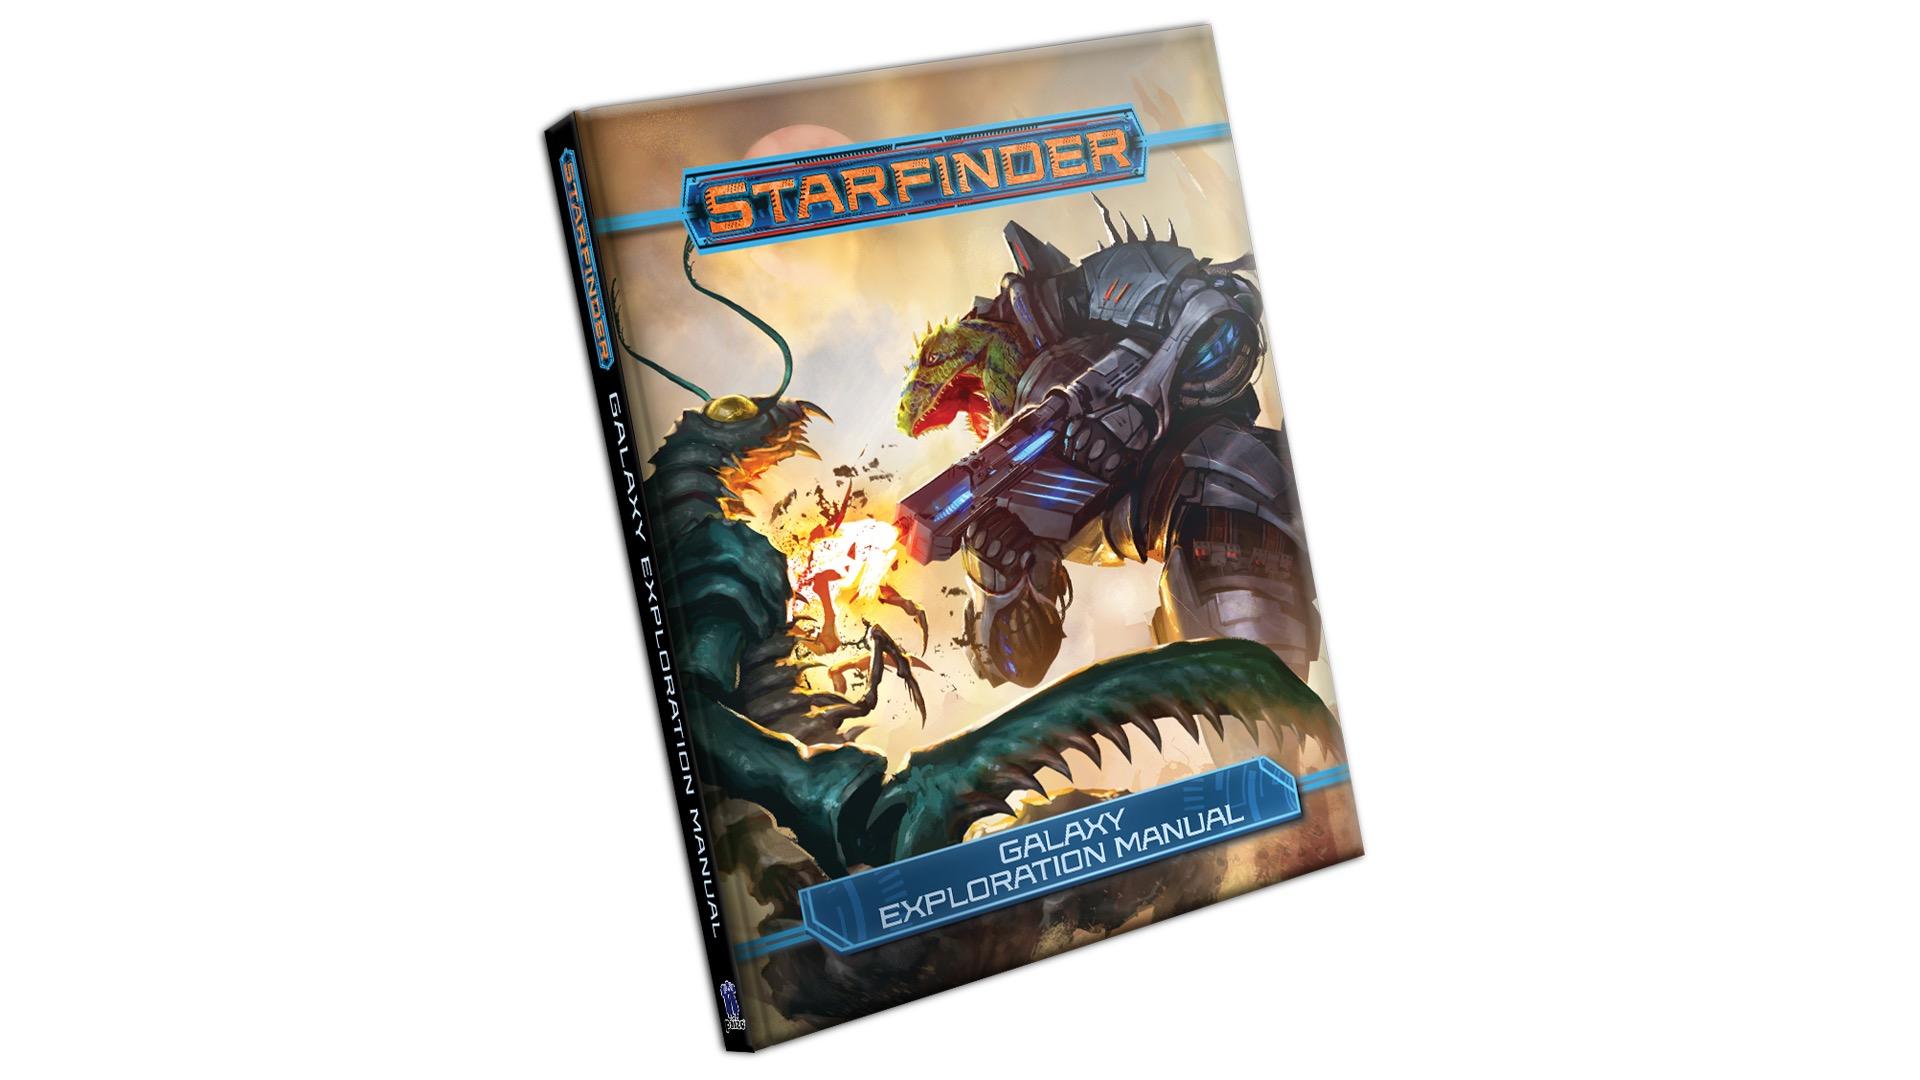 Galaxy Exploration Manual mockup cover